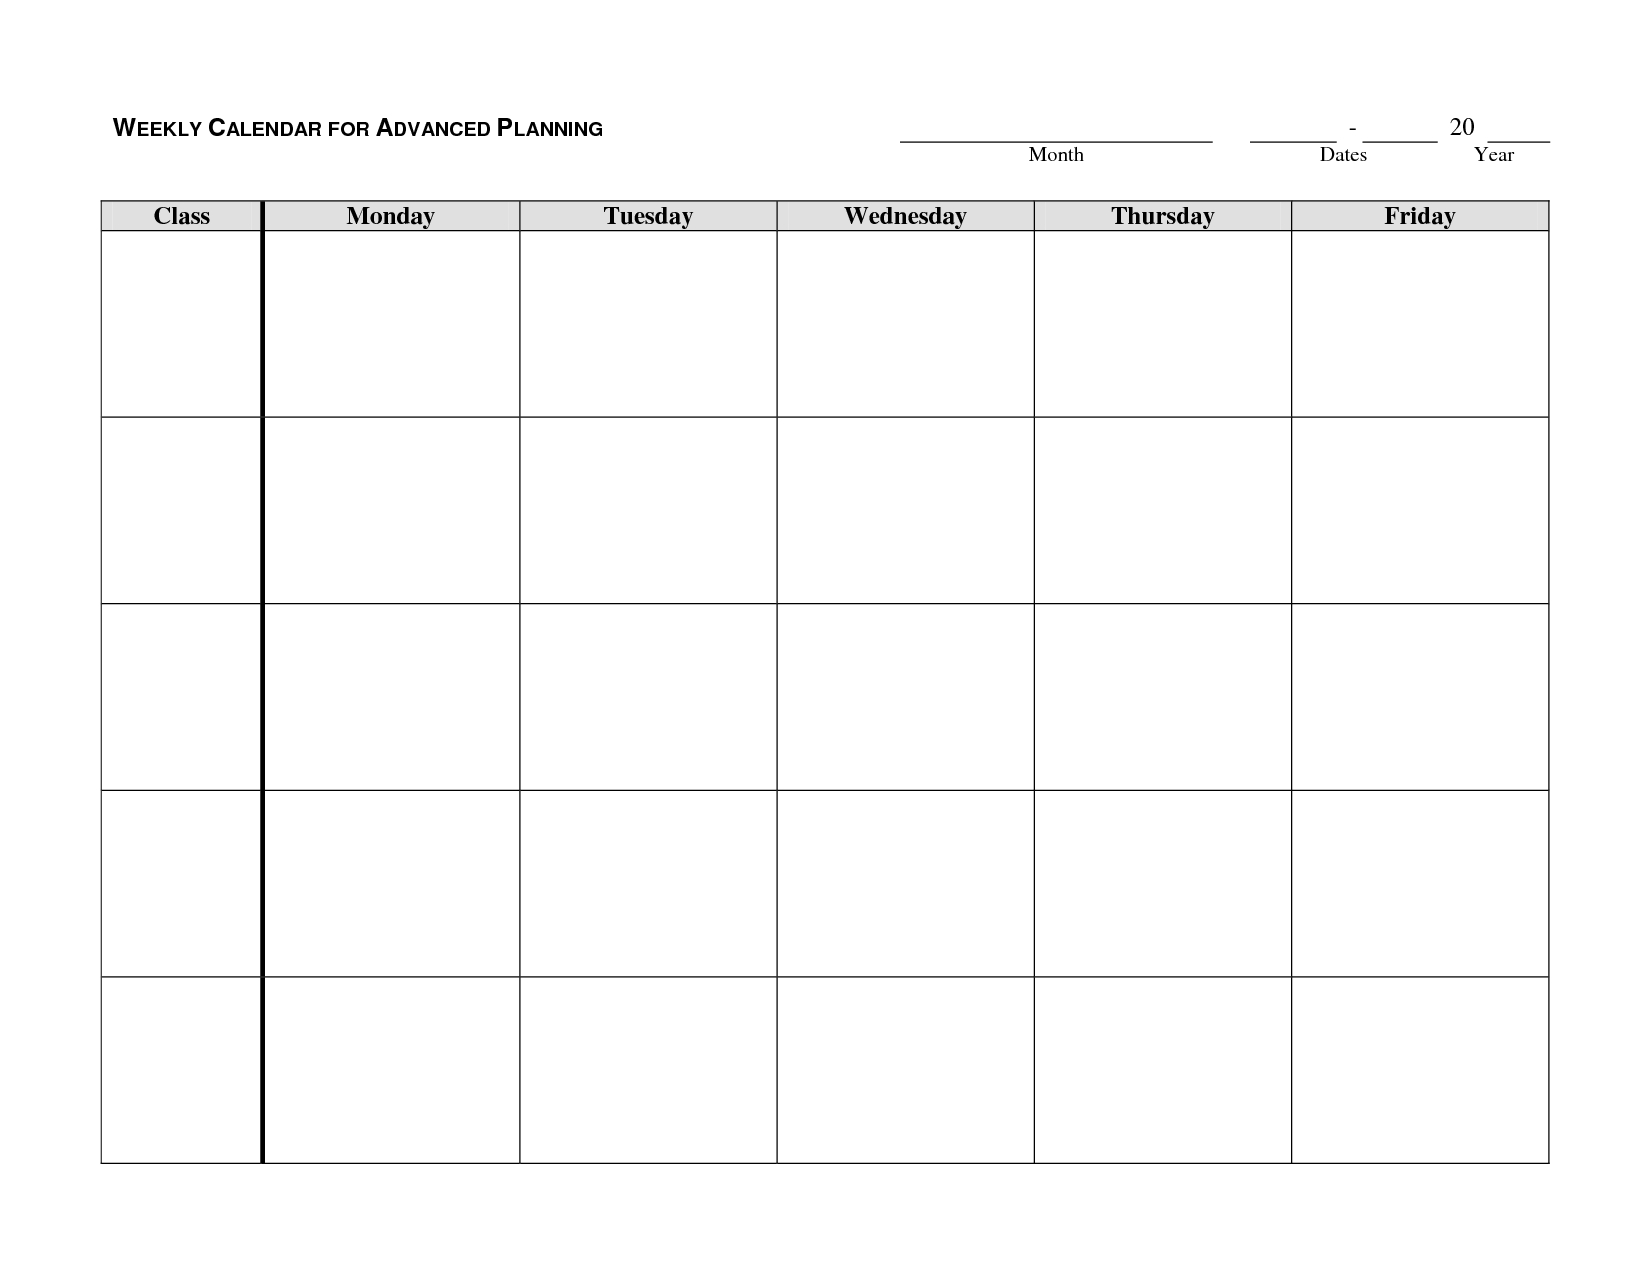 Weekly Calendar Template - Google Search   Blank Calendar 4 Week Calendar Template With Enterable Date